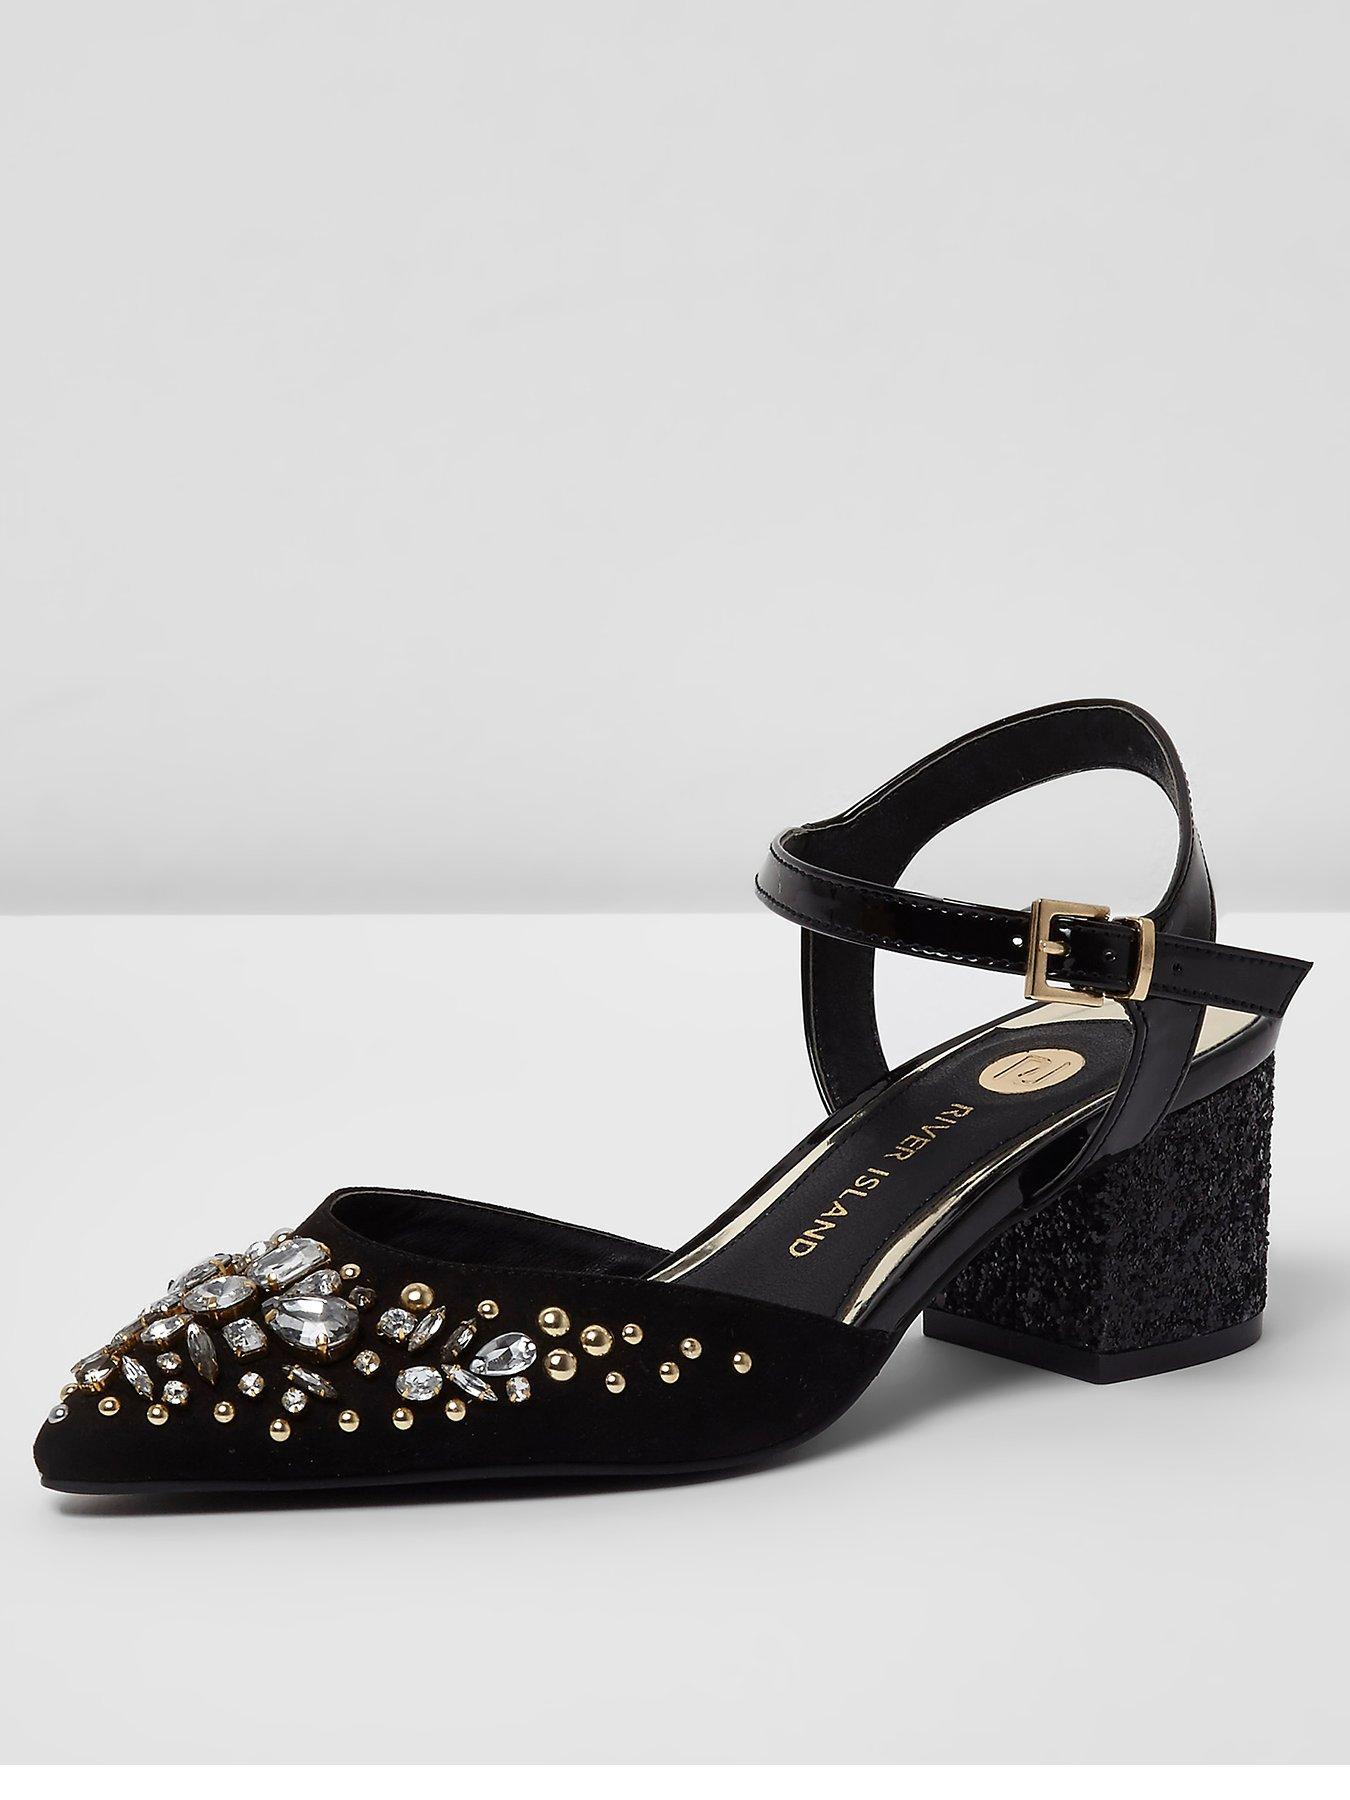 River Island River Island Embellished Pointed Block Heel Sandal Black 1600220706 Women's Shoes River Island Heels